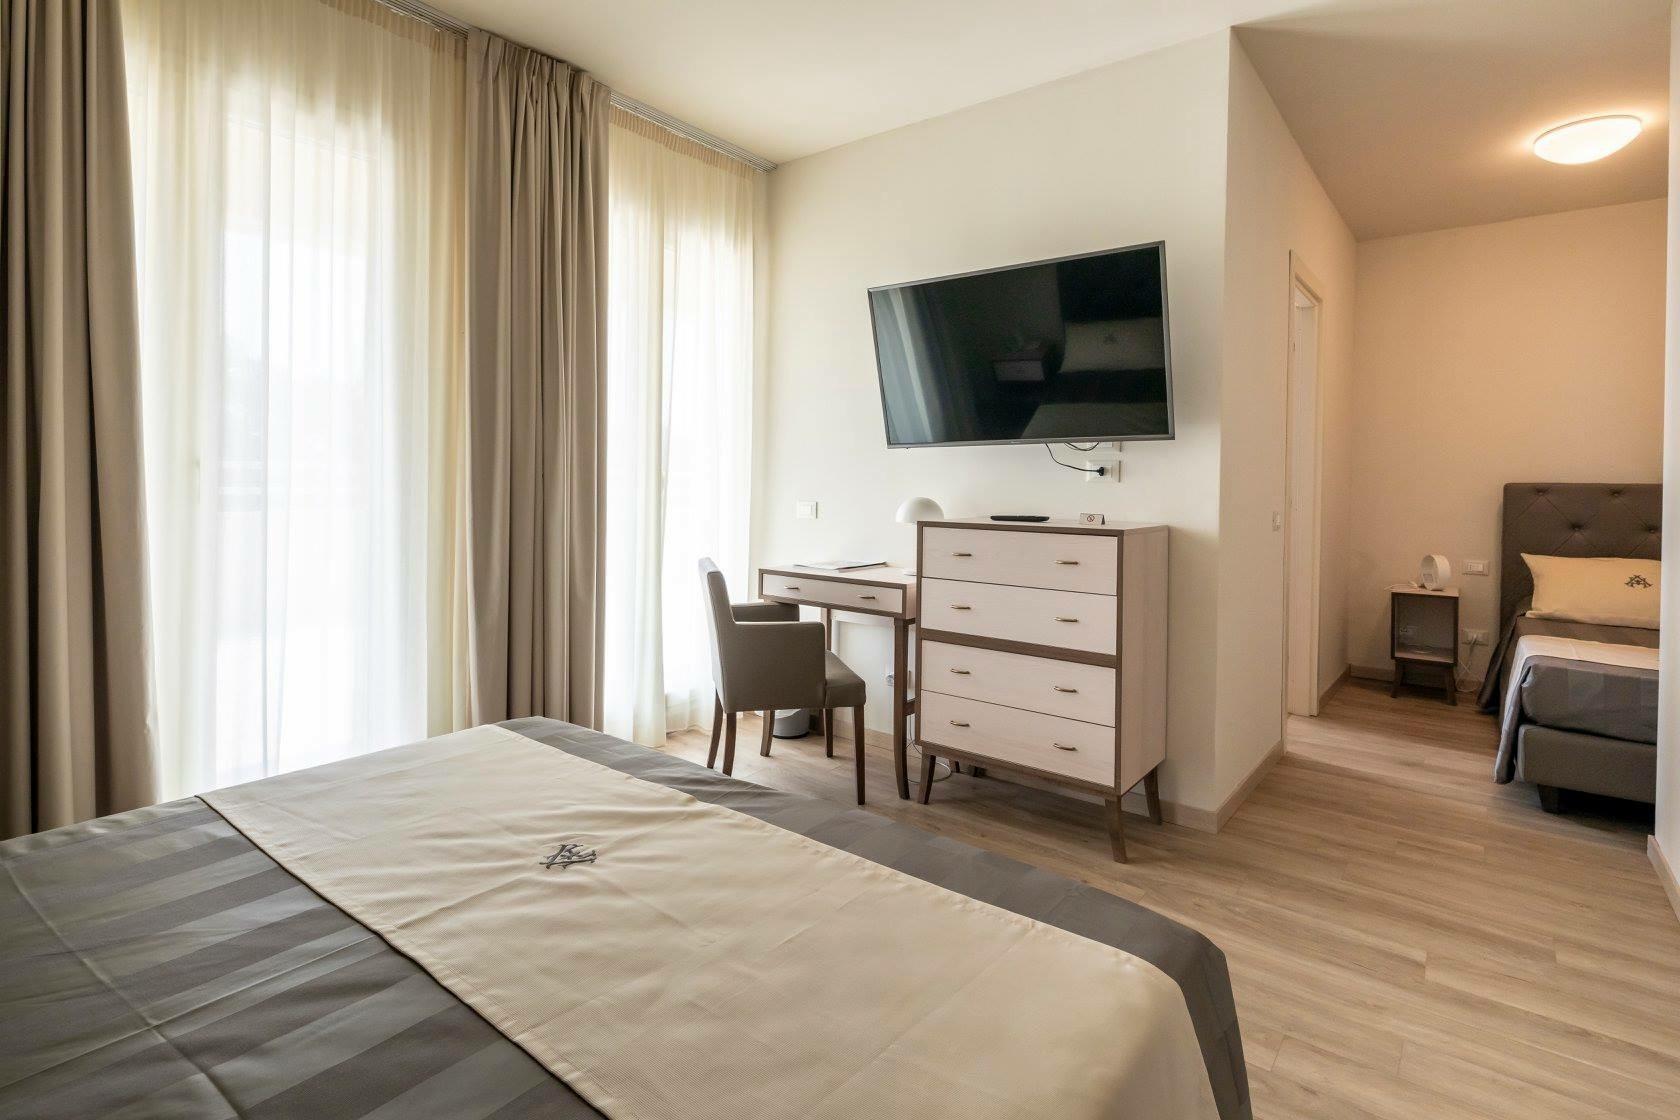 Hotel Atlantico 2020 camera tripla